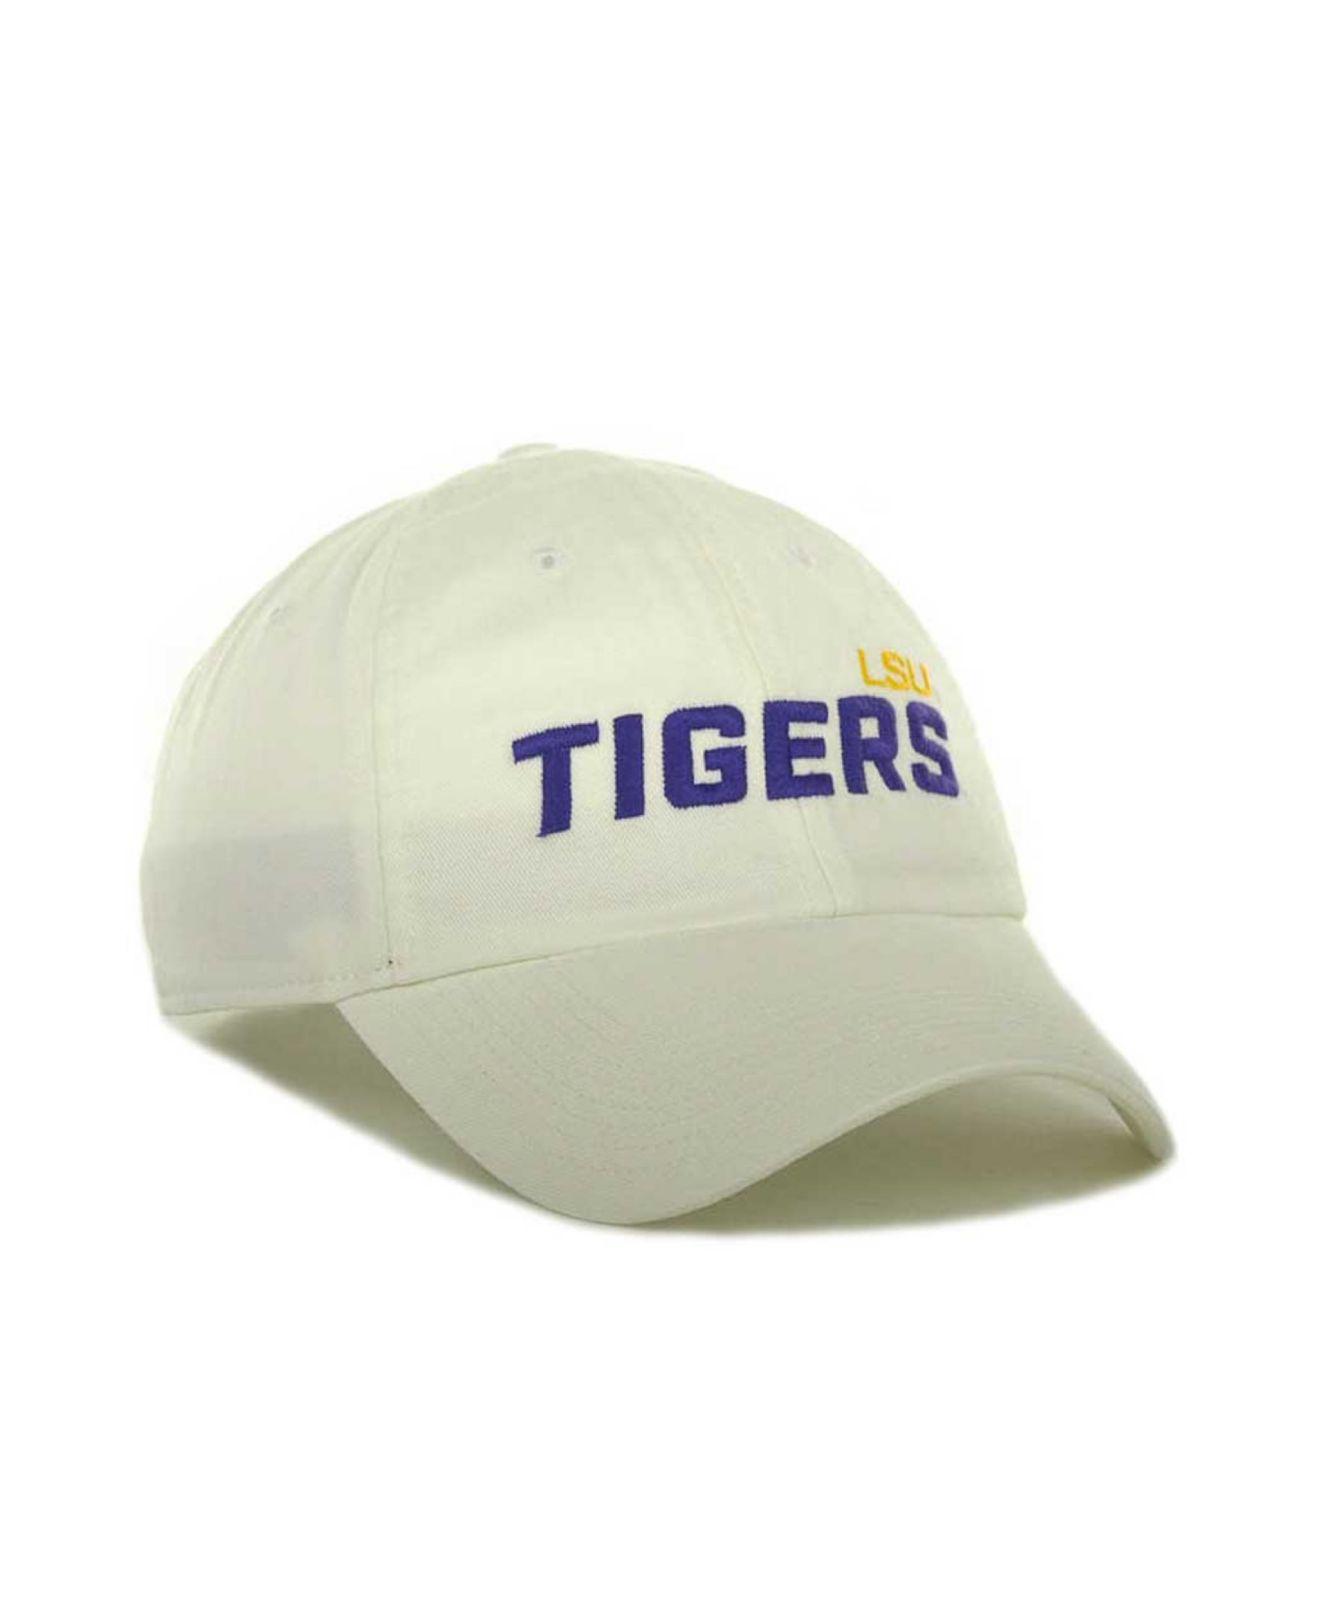 8bcac57543f ... sale lyst nike lsu tigers heritage 86 campus cap in white for men ba0e8  ddfa5